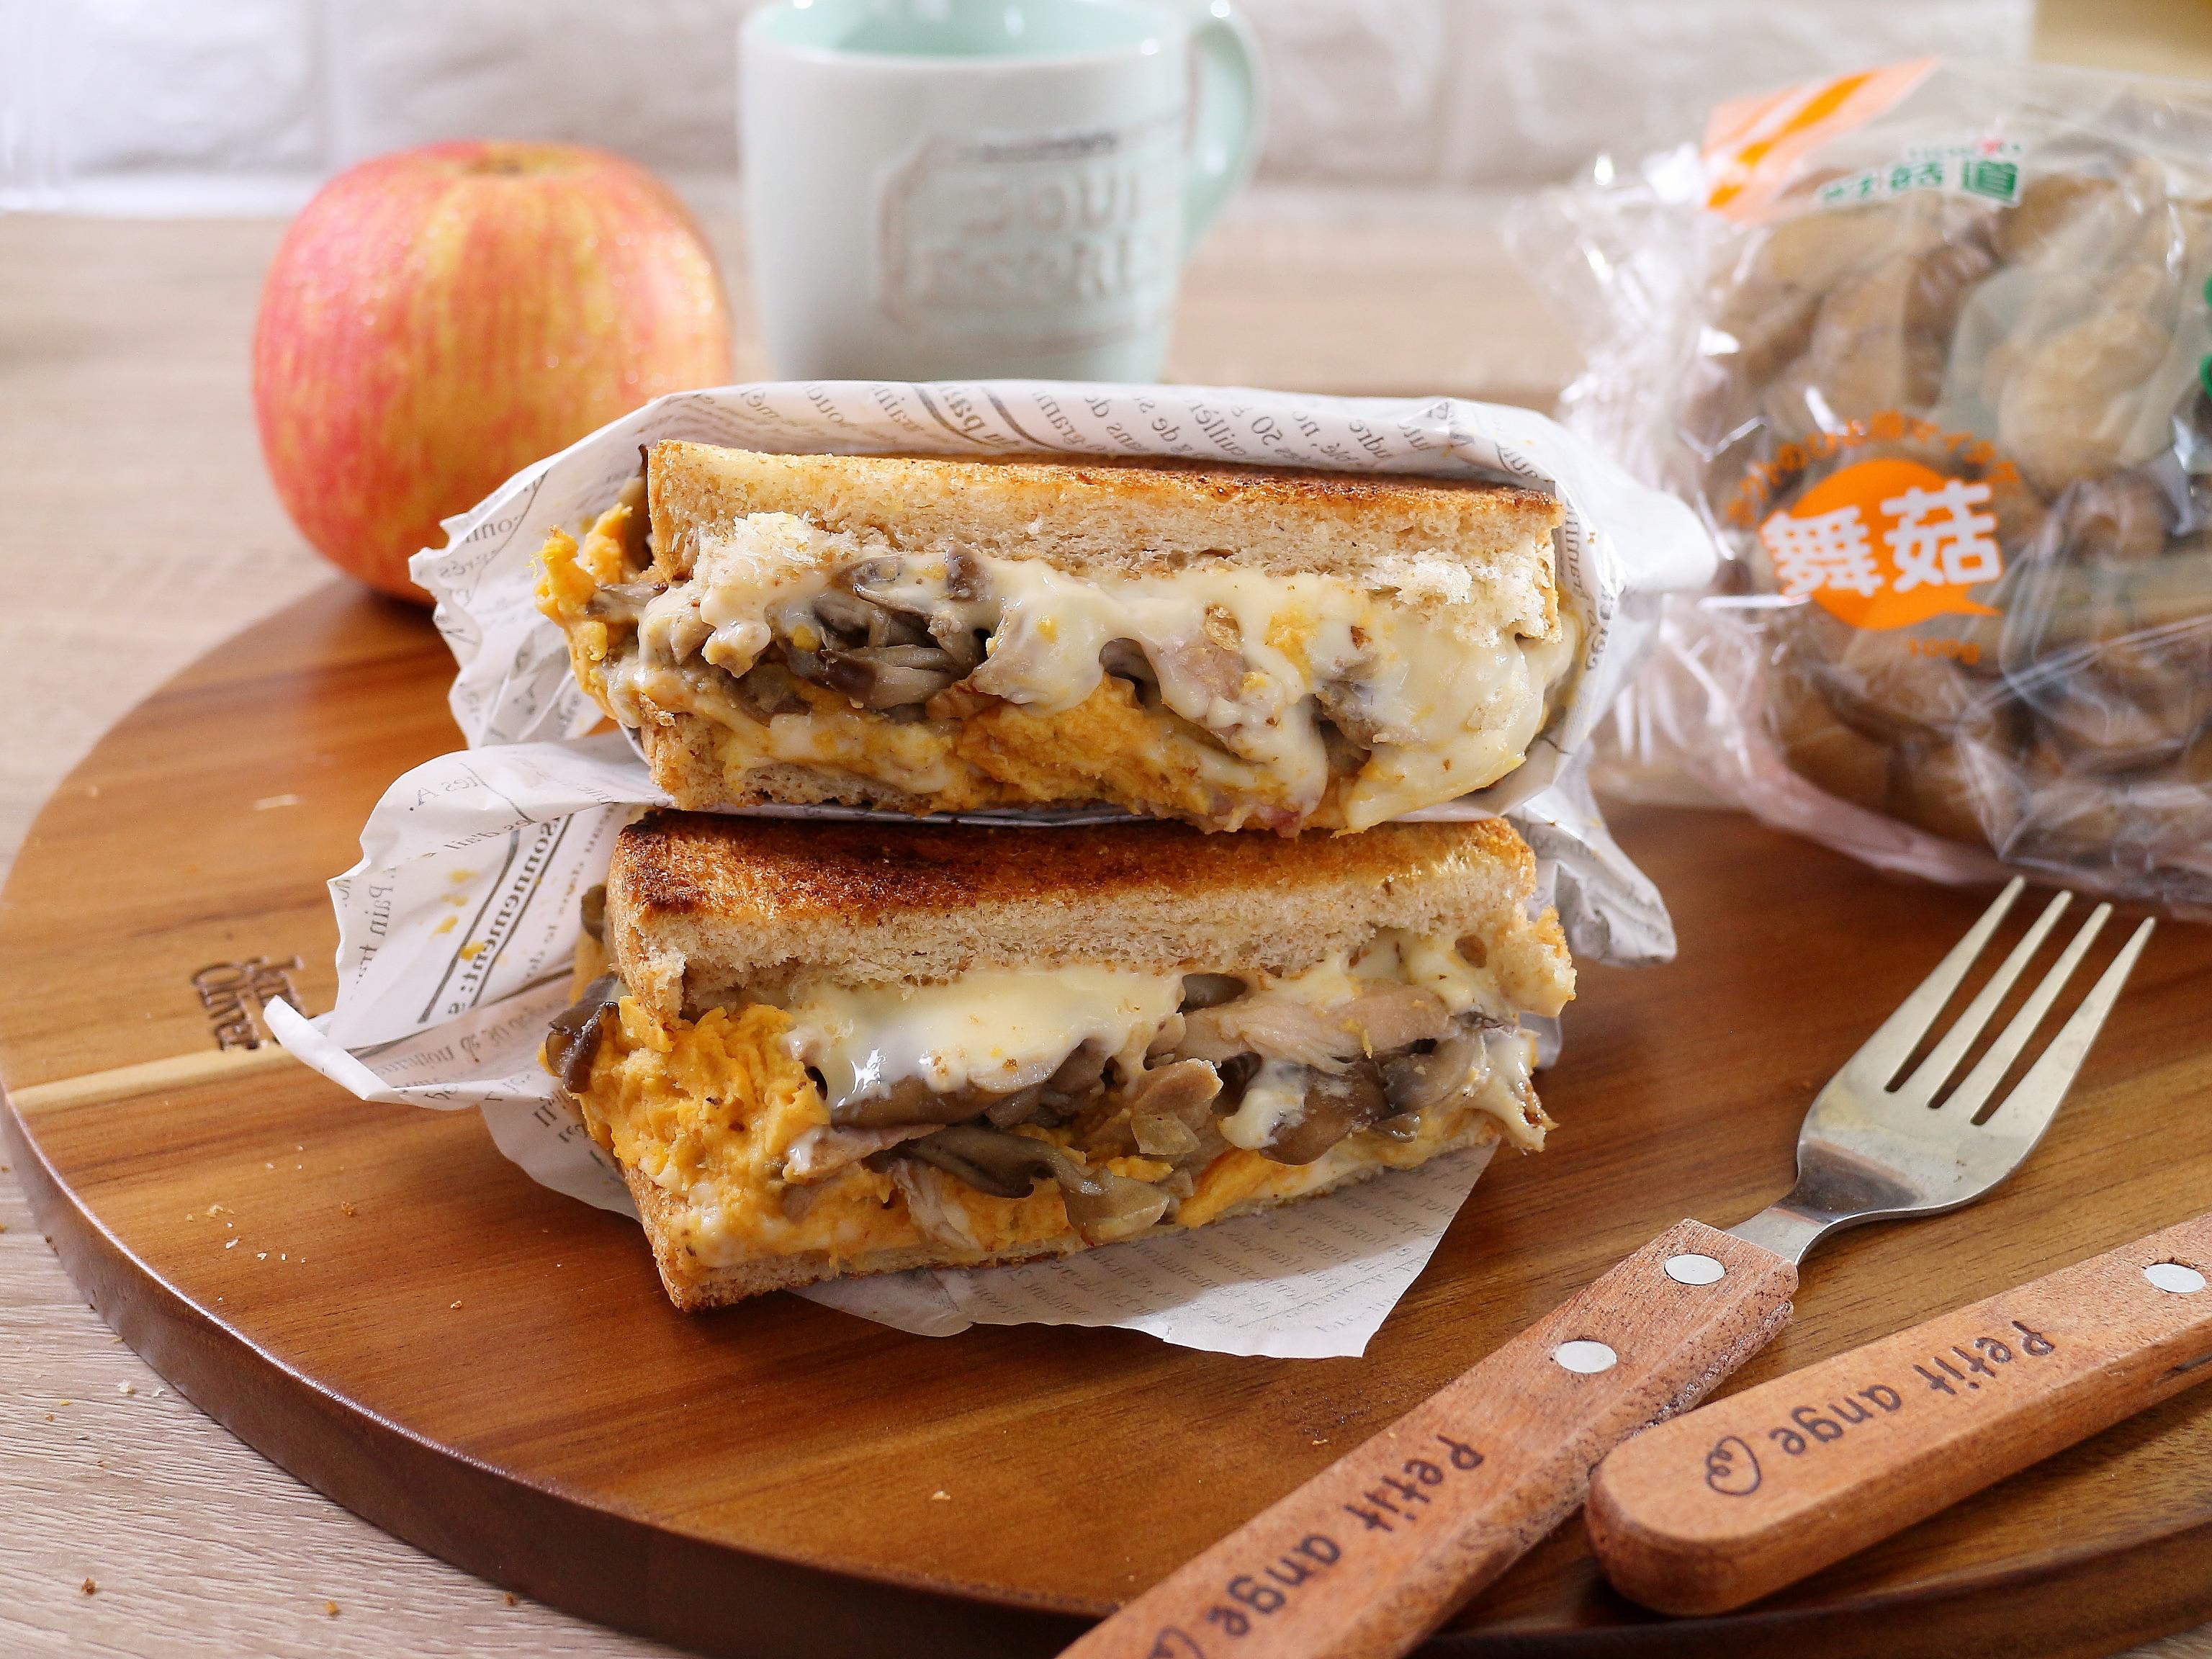 地瓜菇菇燻雞三明治